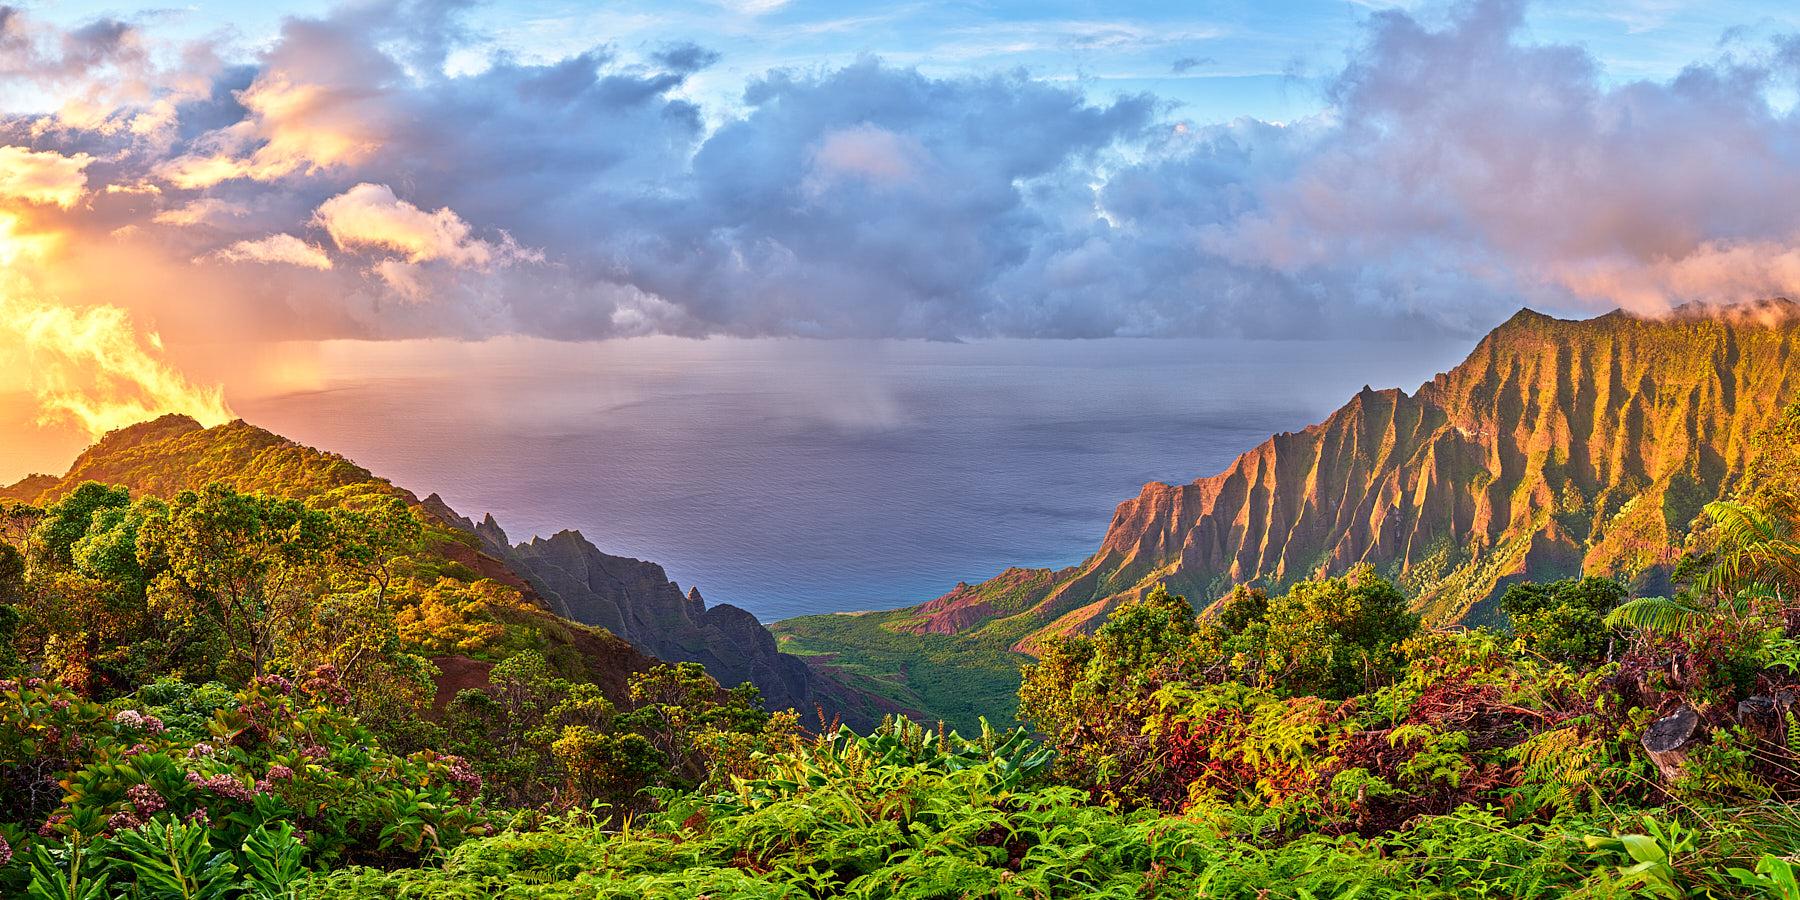 panoramic sunset captured at the beautiful Kalalau Valley along the Na Pali Coastline of the Hawaiian island of Hawaii